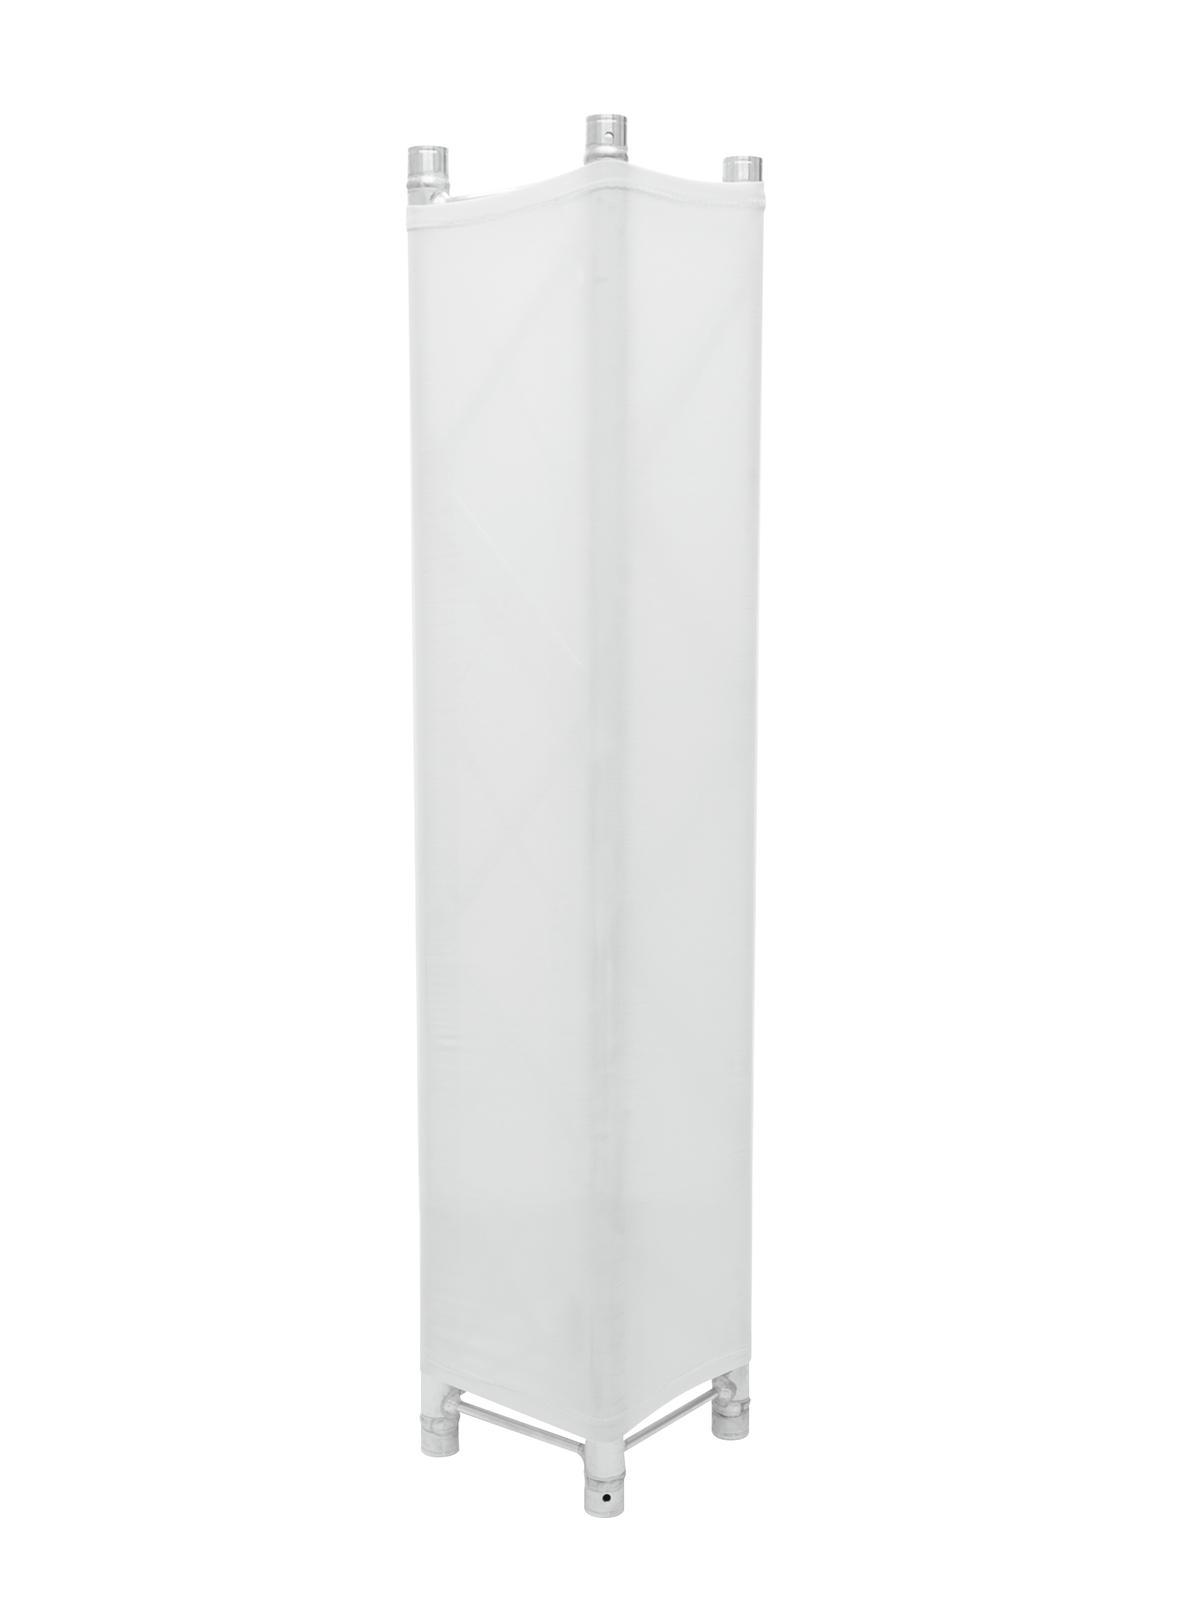 EXPAND Trusscover für Decolock 100cm weiß